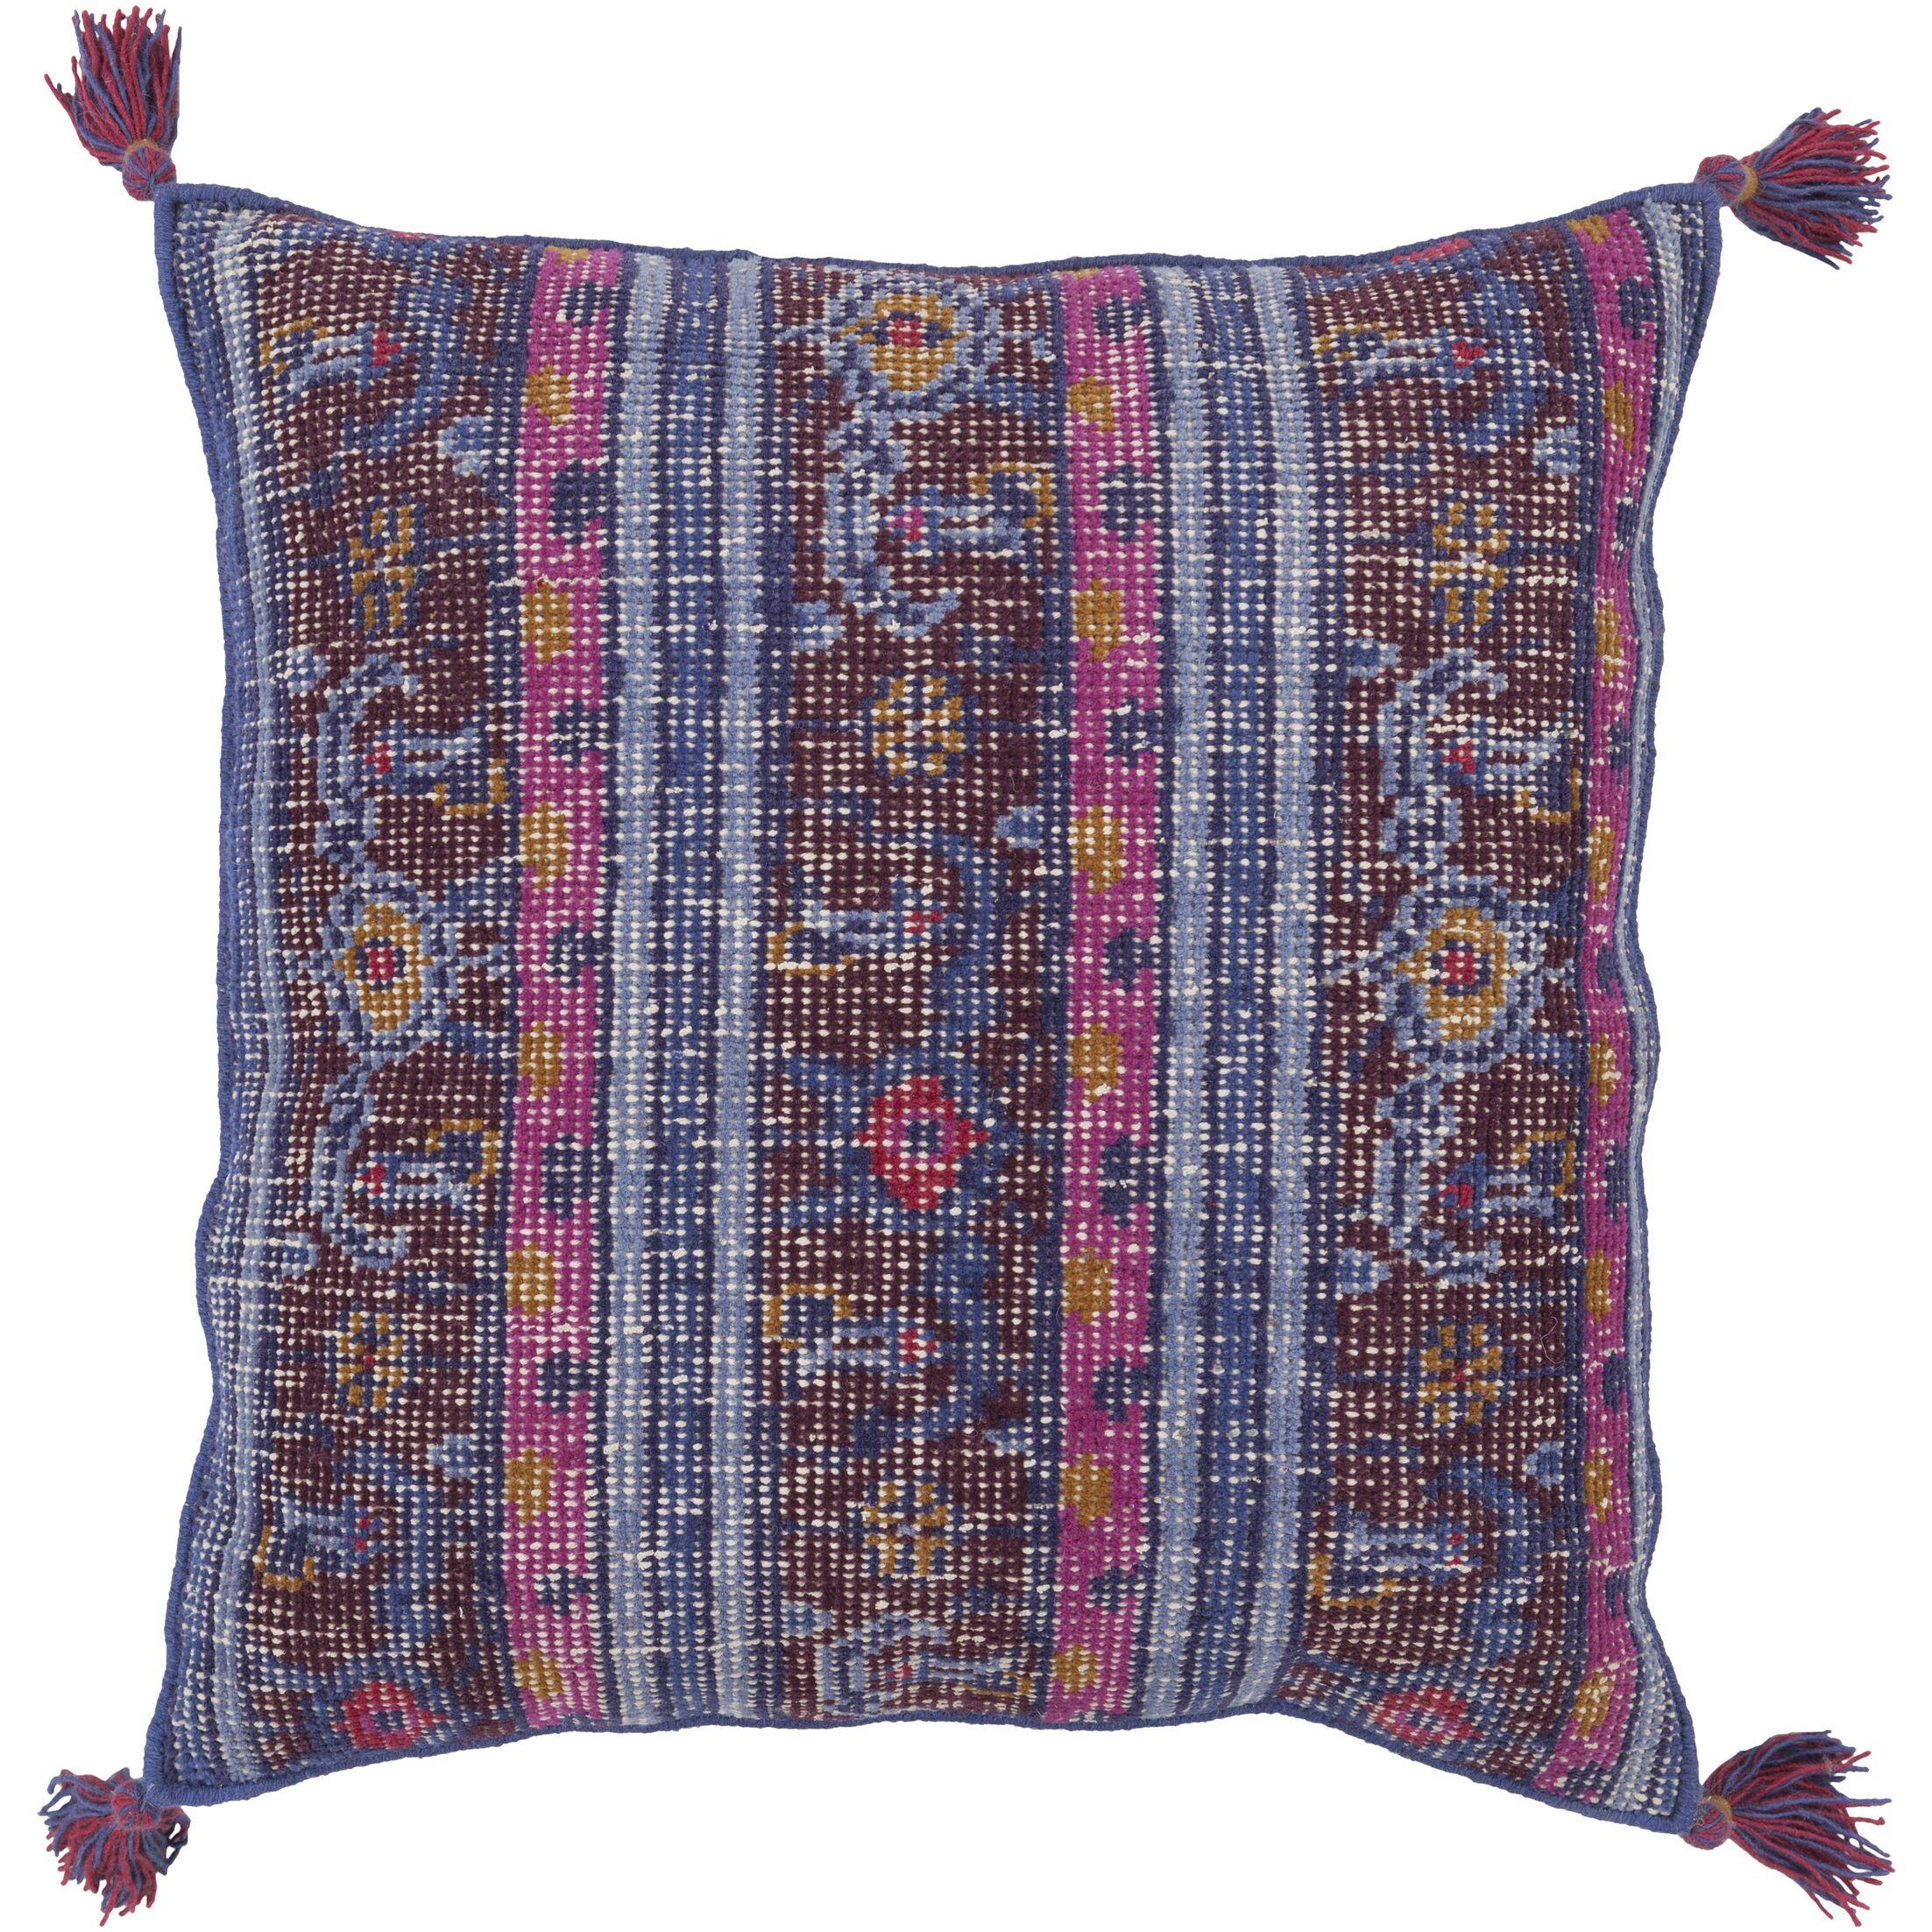 Blackshear 100% Wool Throw Pillow Cover Color: BluePurple